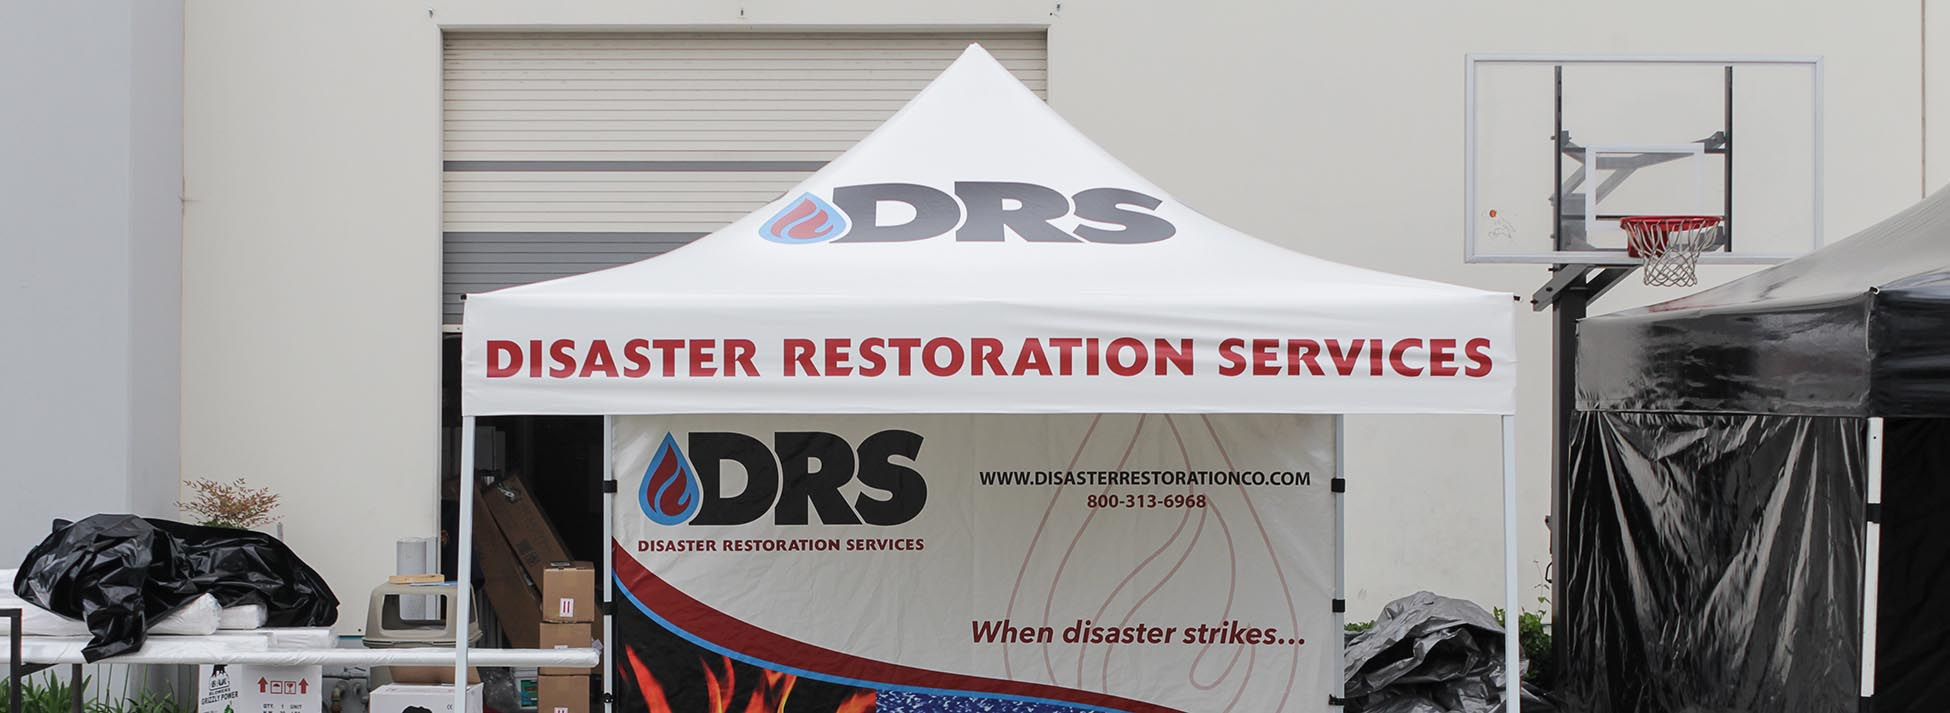 disaster-restoration-services-header.jpg